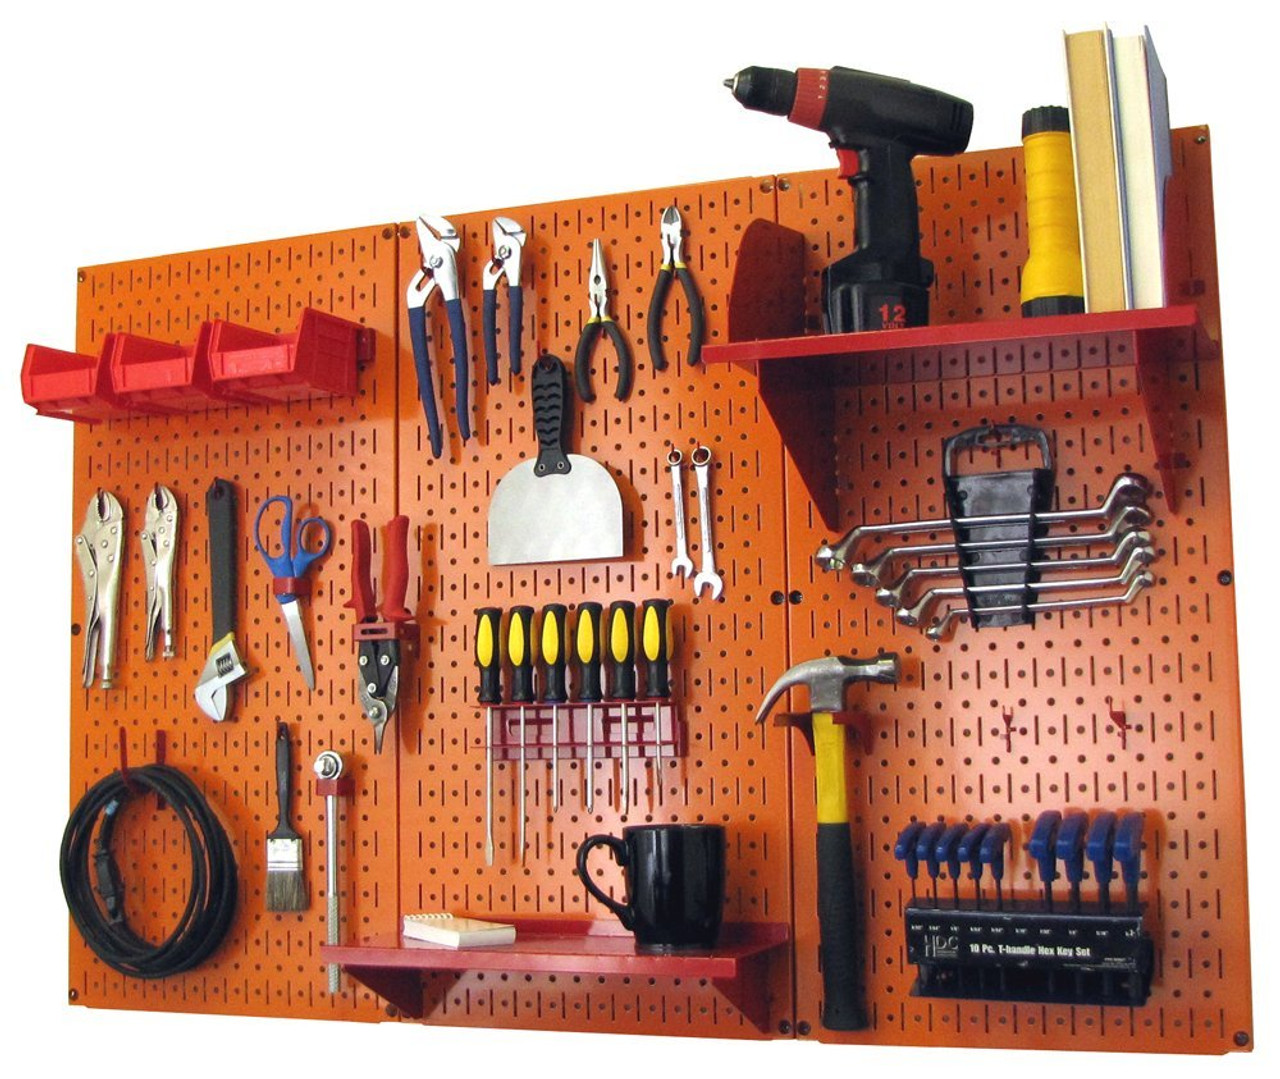 Garage Tools Organizer: 4ft Metal Pegboard Standard Tool Storage Kit